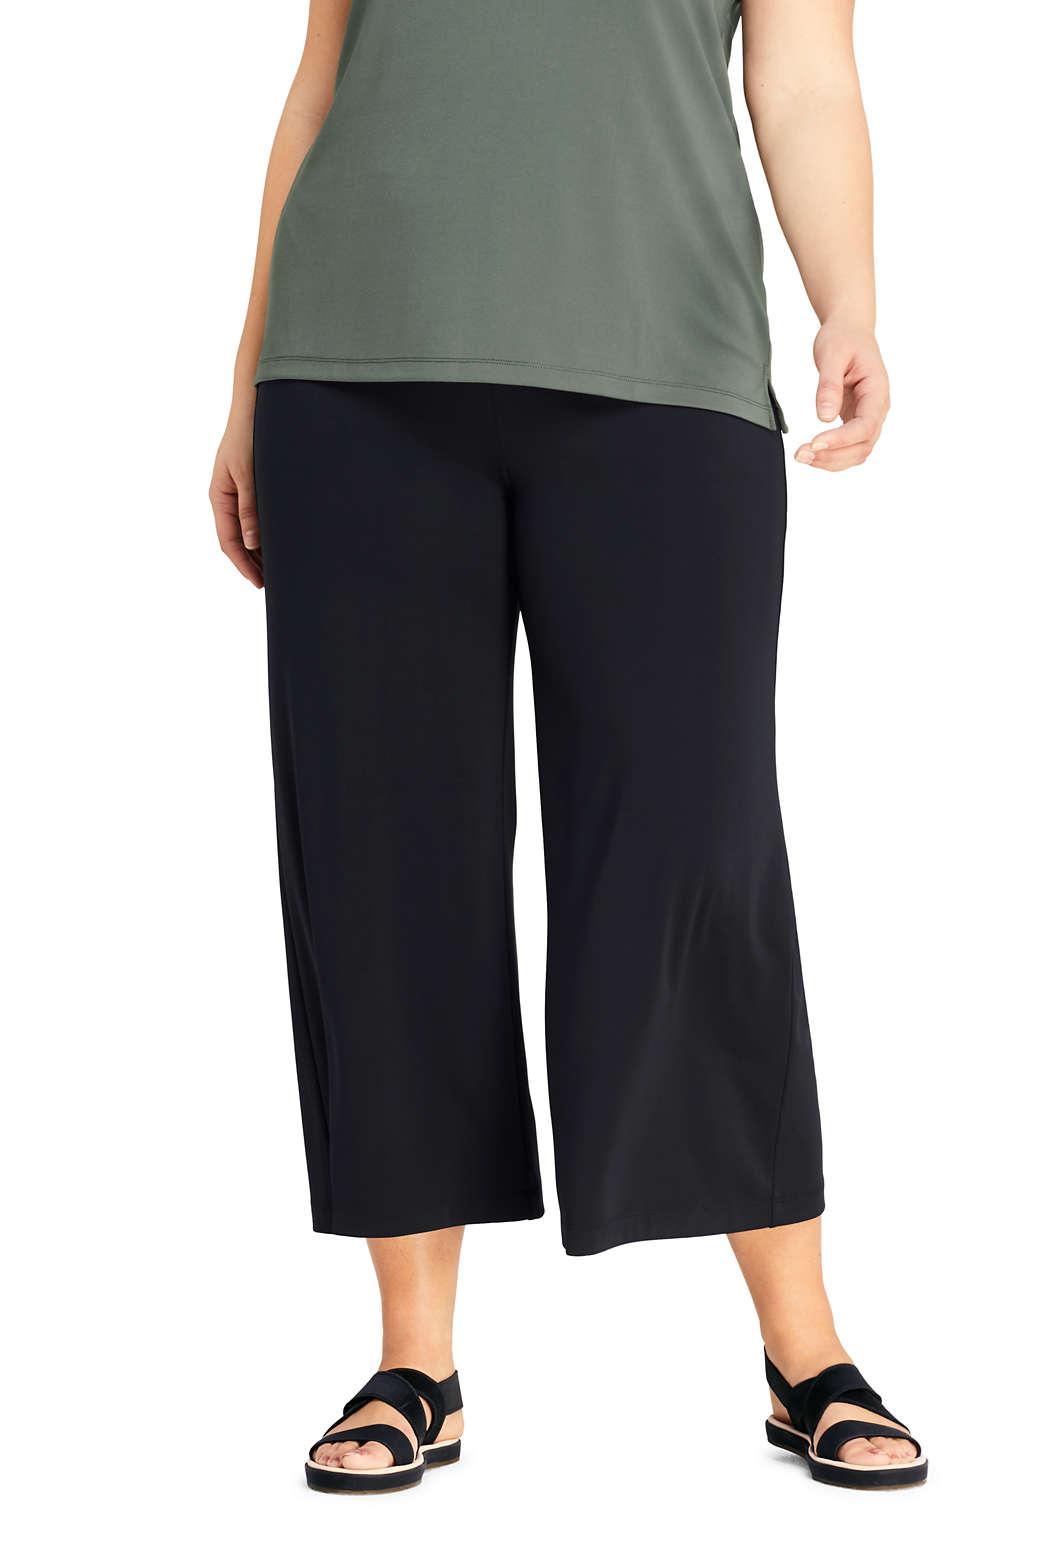 982d93b561 Women s Plus Size Matte Jersey Wide Leg Crop Pants from Lands  End